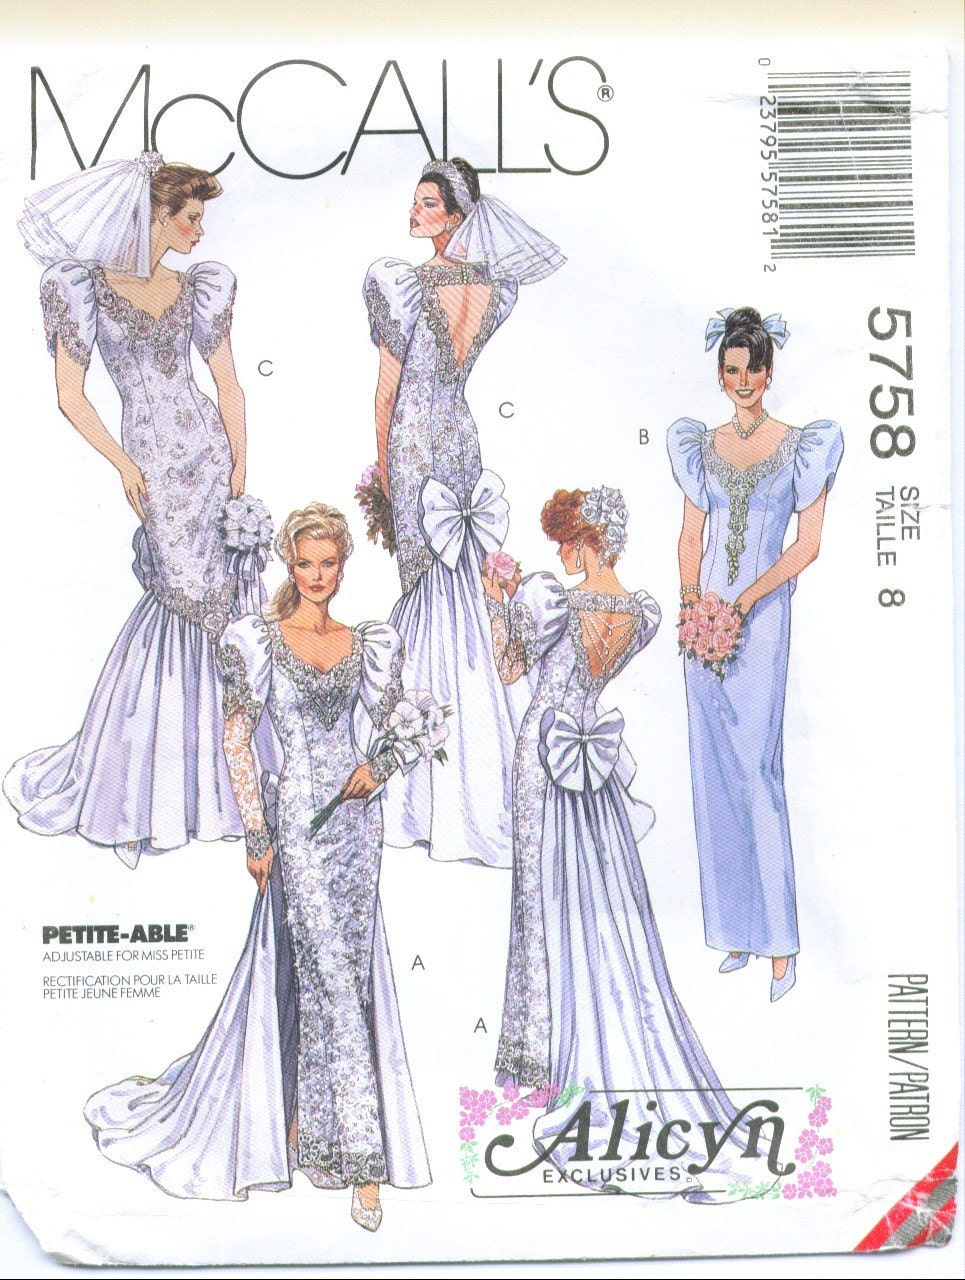 Mccall 39 s 5758 alicyn wedding dress sewing pattern size 8 for Wedding dress patterns mccalls